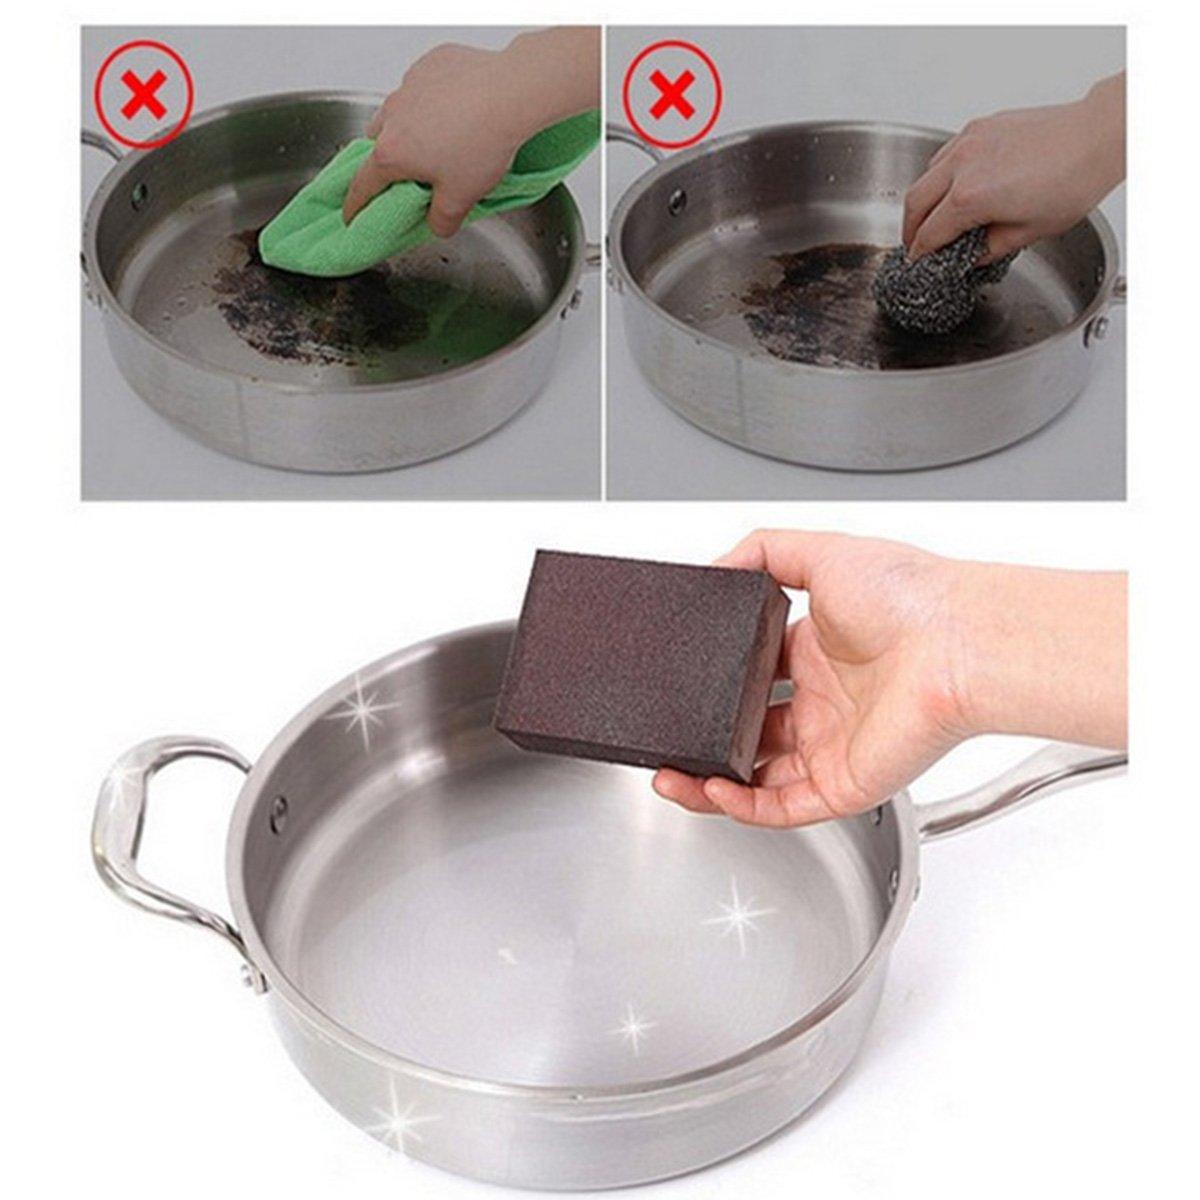 Walnut Scrubbers GRATITUDE Dish Sponges Household 6 pcs Naturals Stink Free Nano carborundum Cleaning Sponges Inhibit Bacteria.Stay Fresh NO ODOR Guarantee!Eco kitchen